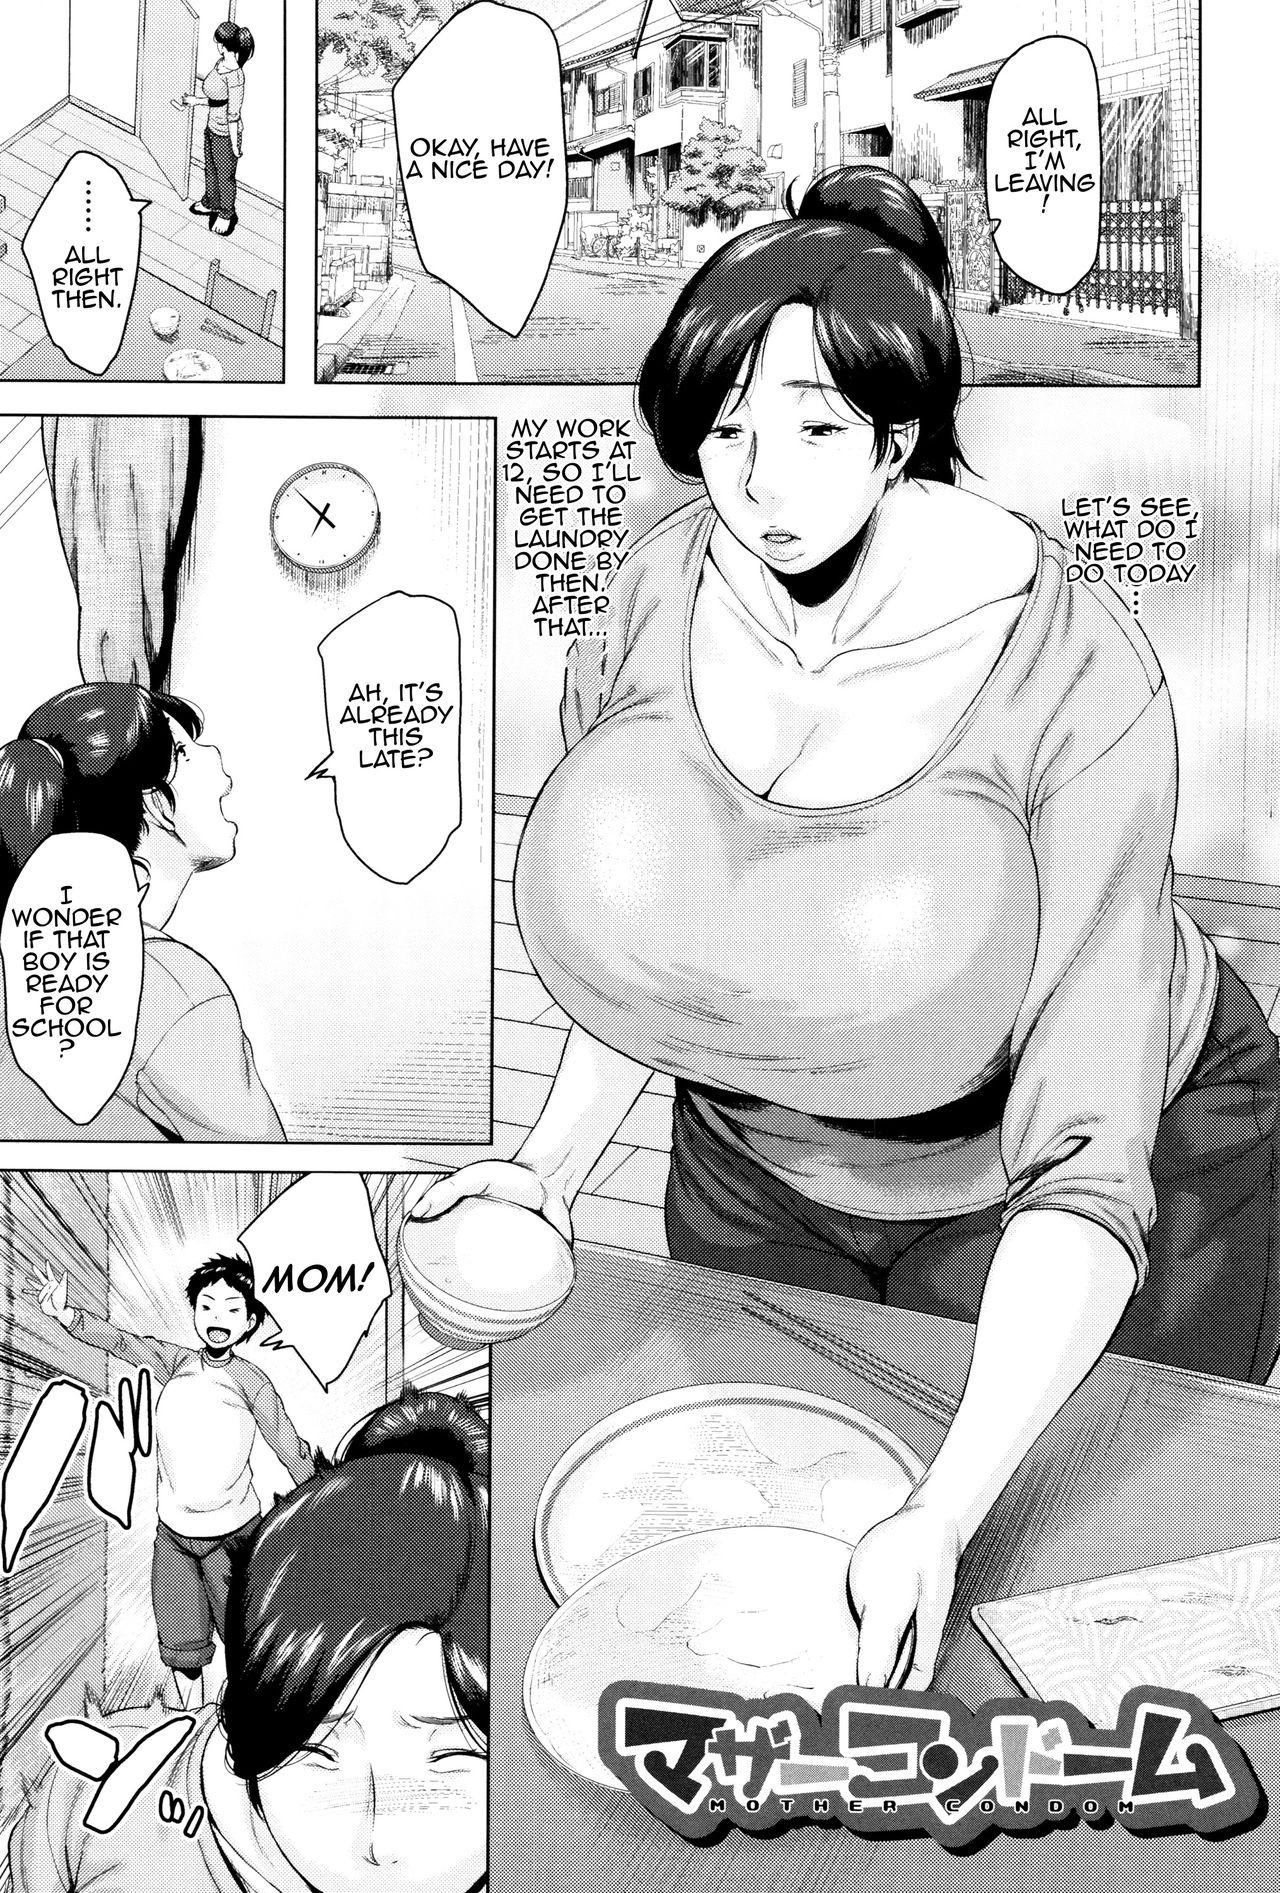 [Jitsuma] Kinyoubi no Haha-tachi e - To Friday's mothers [English] [Amoskandy, desudesu, Kusanyagi] 7